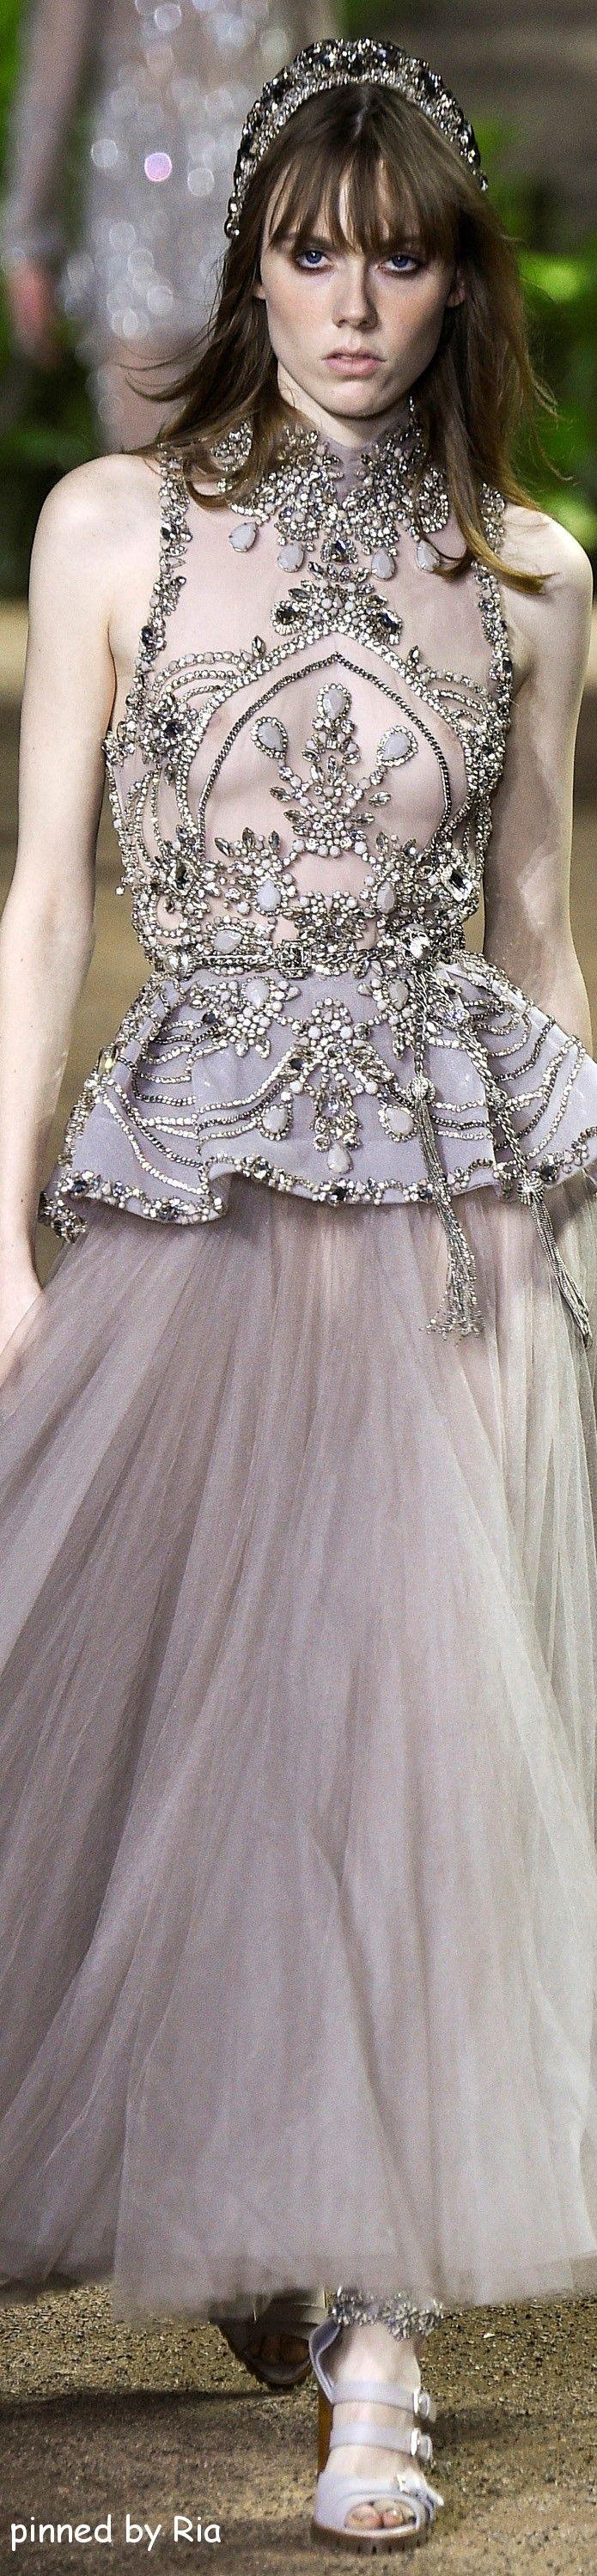 Elie Saab Spring 2016 Couture l Ria